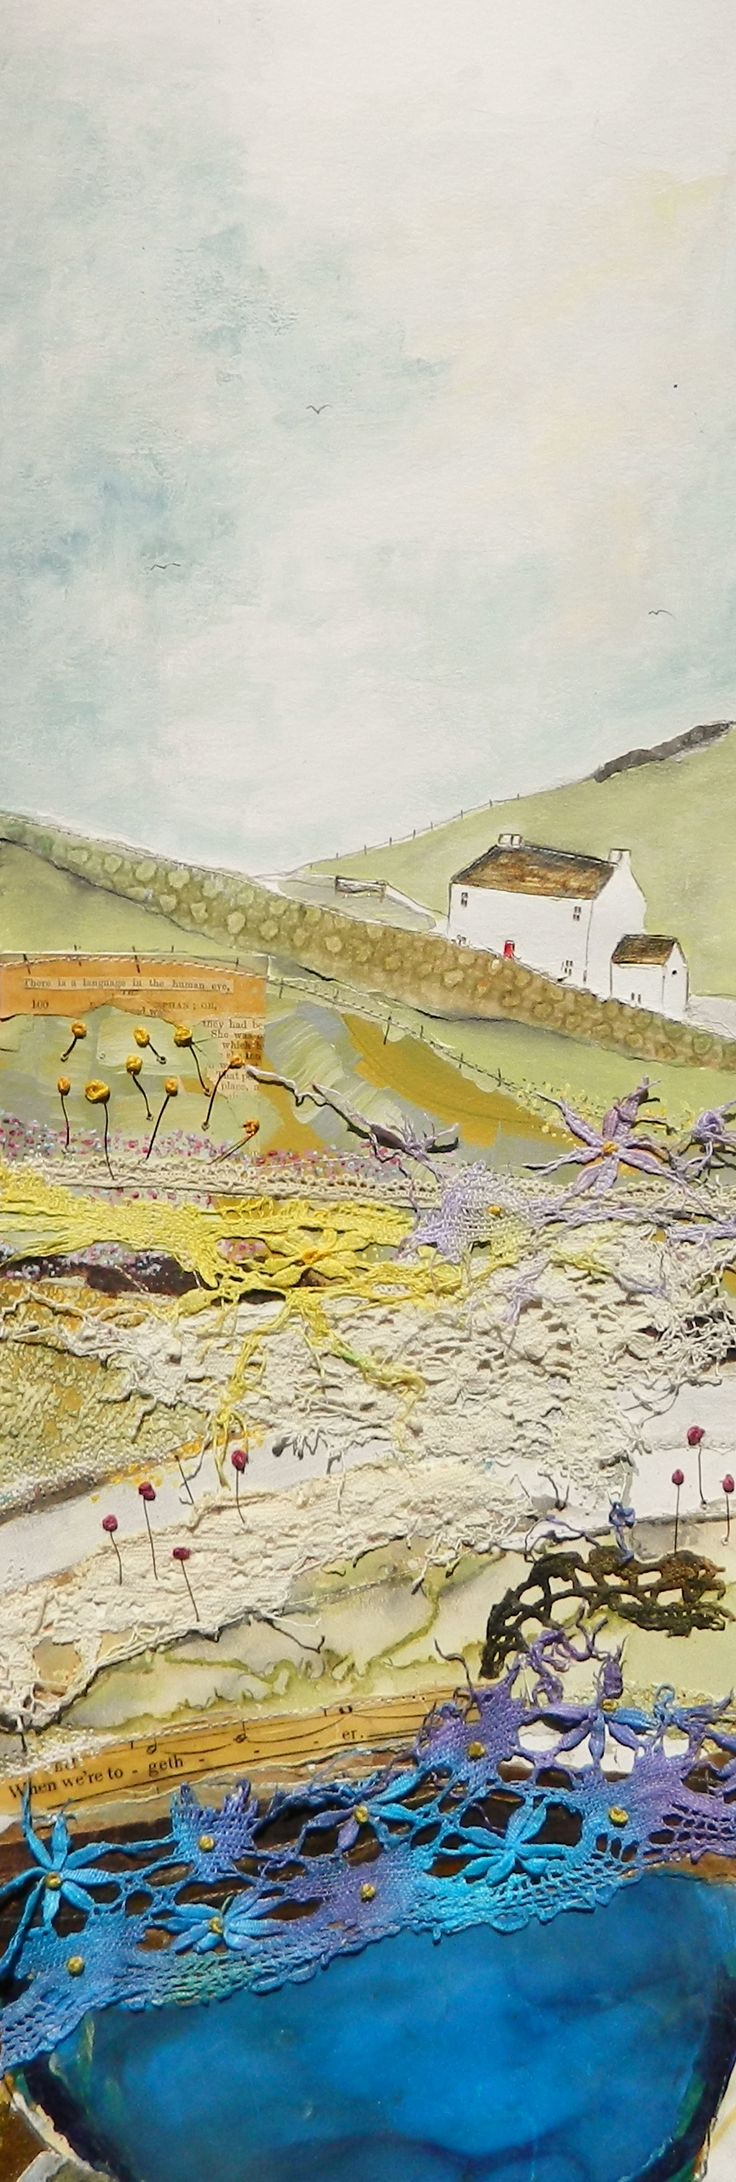 ''Up high on hill near meadow farm gate'' by Louise O'Hara